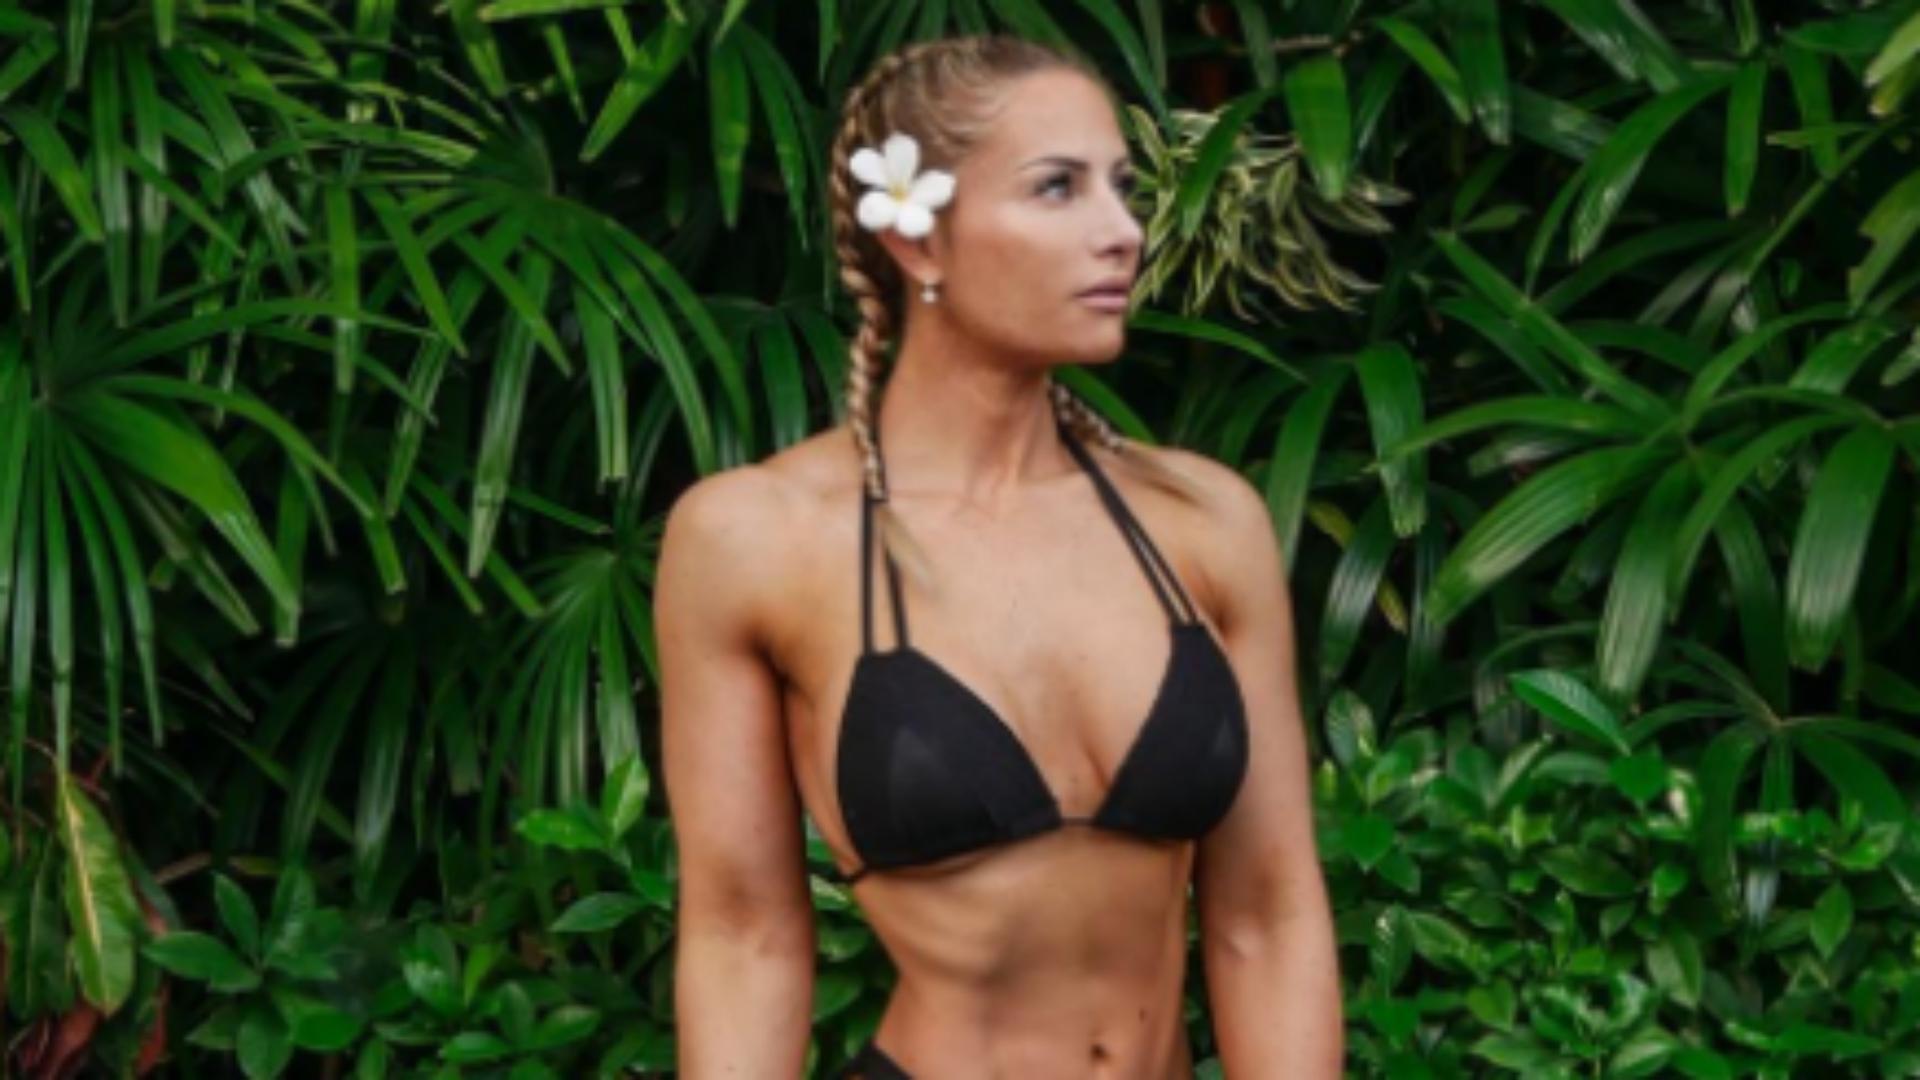 Bikini whipped cream fight